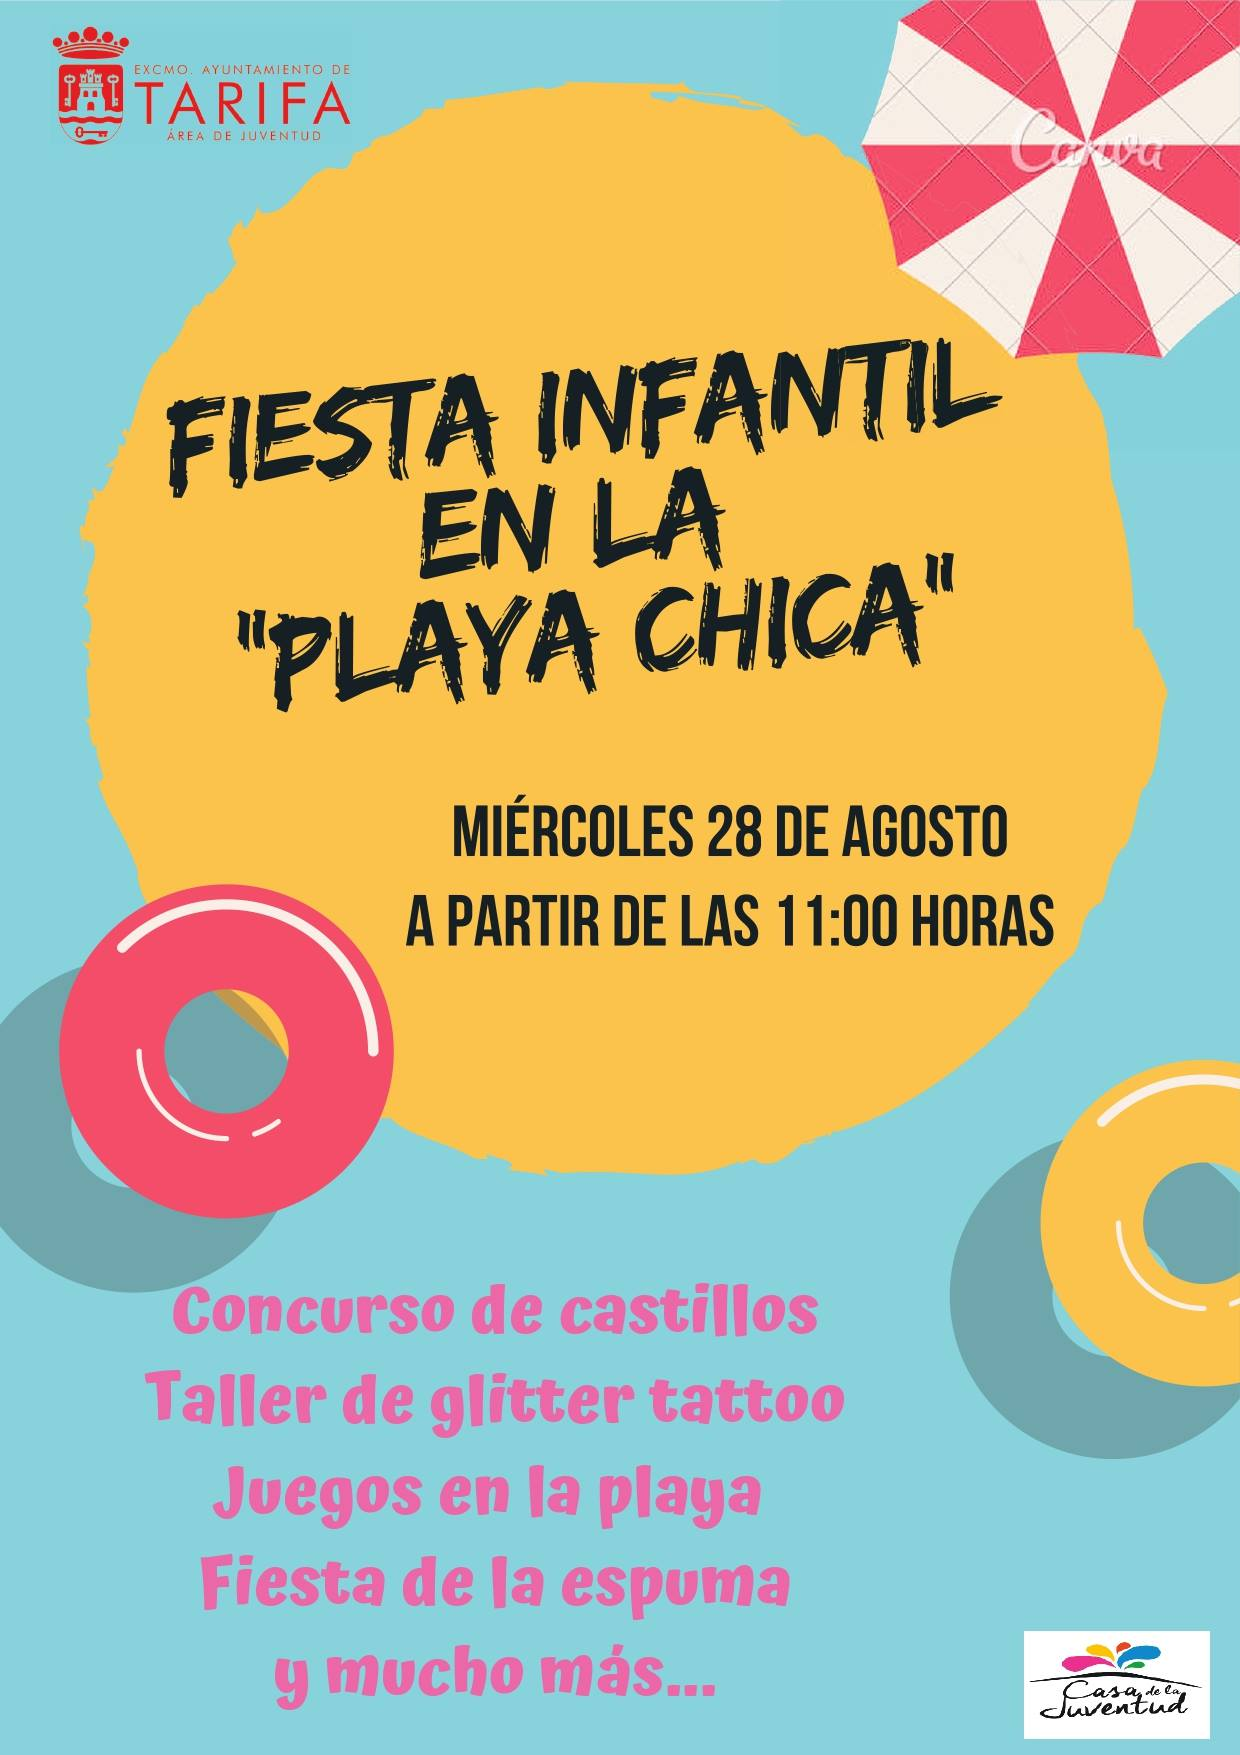 Fiesta Infantil en la Playa Chica de Tarifa Agosto 2019